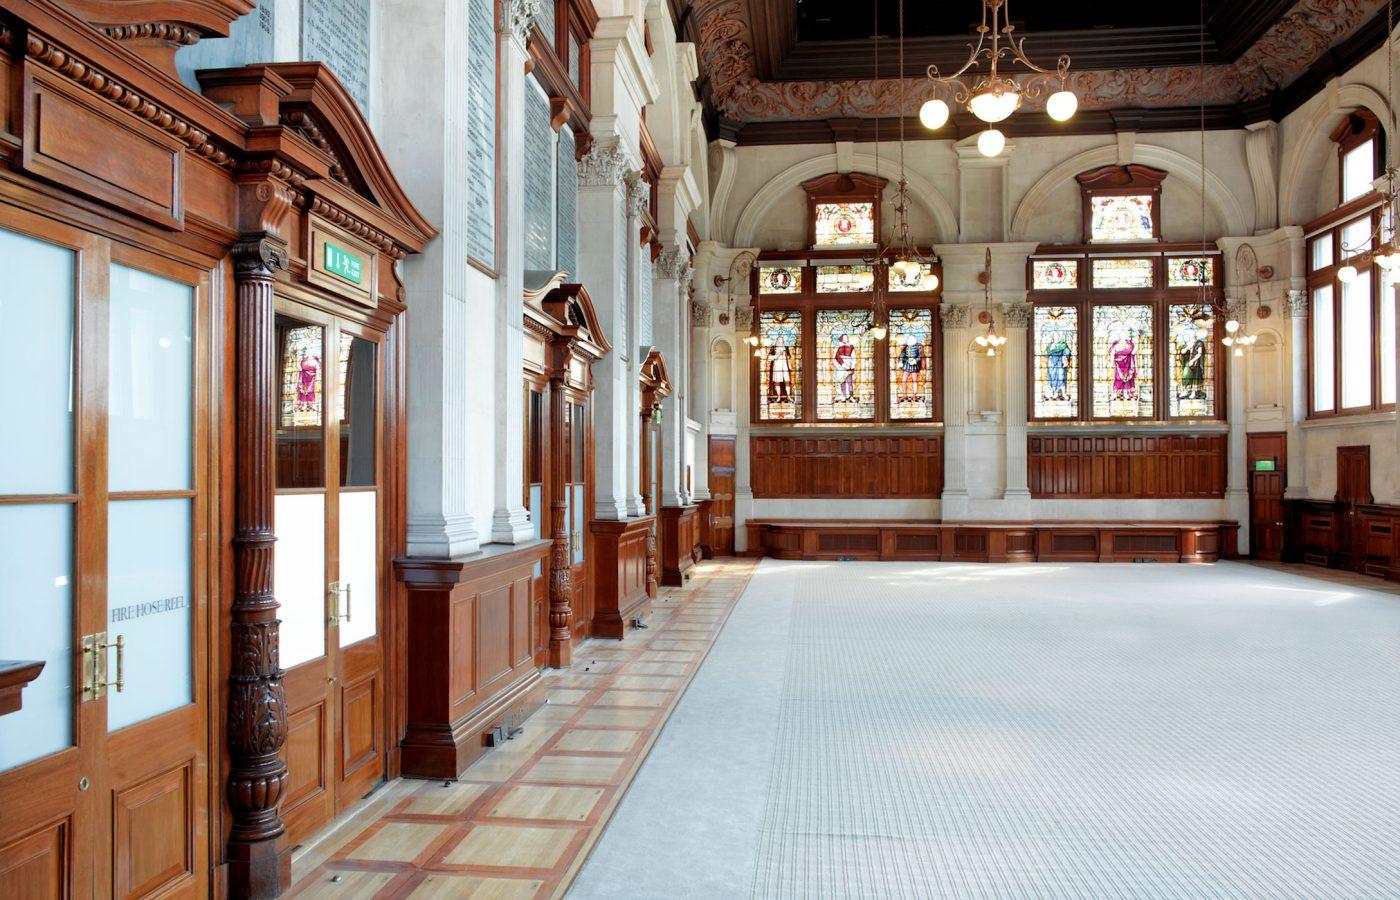 City of London School Great Hall